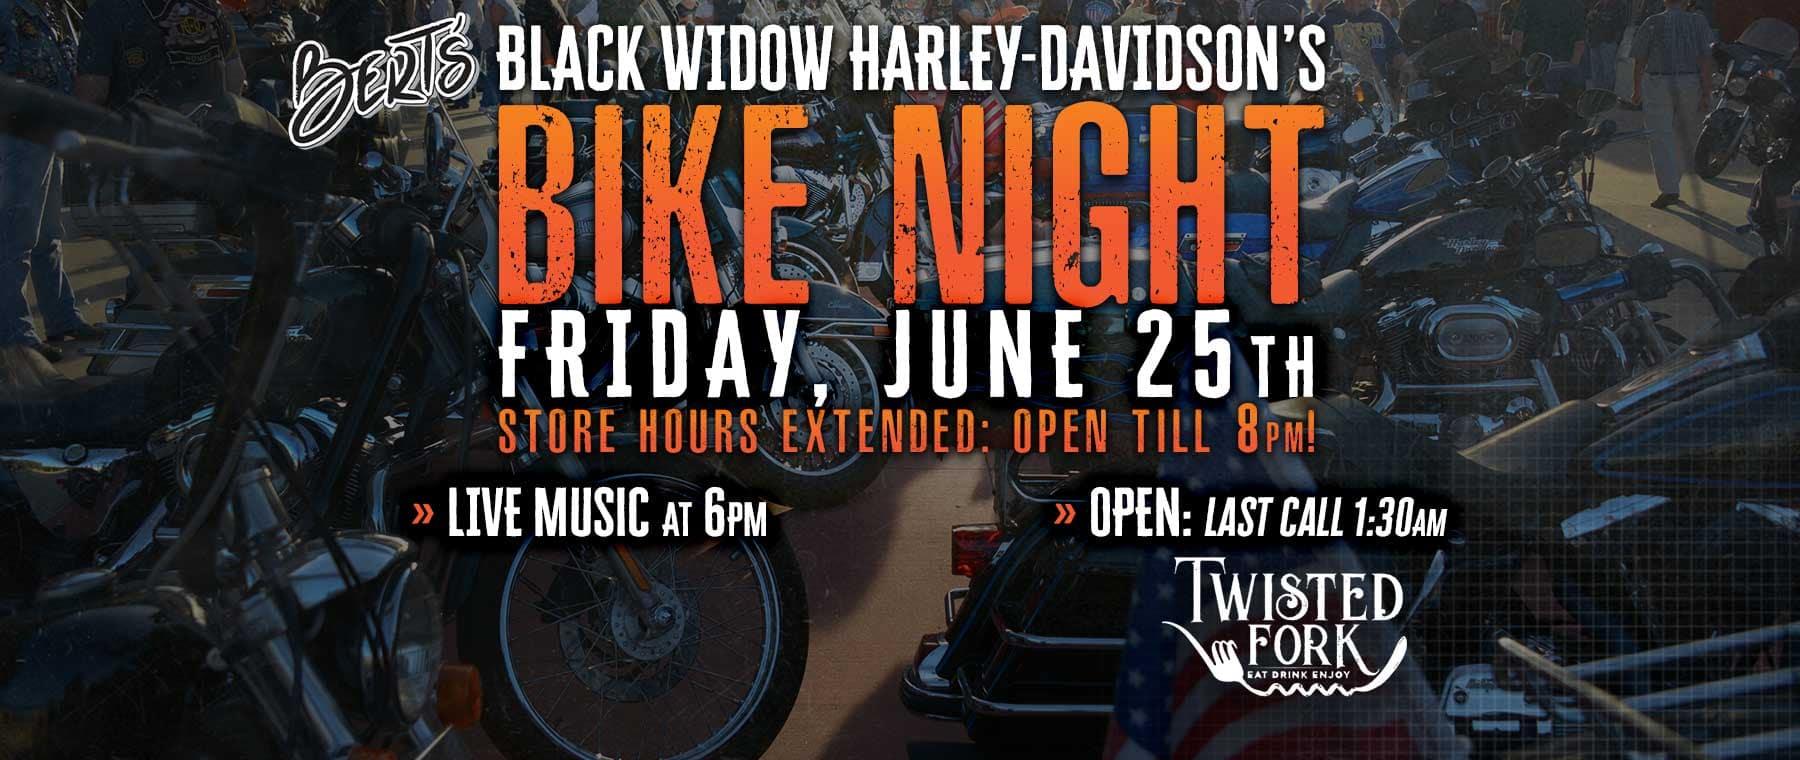 BERTS-HD_060121_June-BikeNight-web